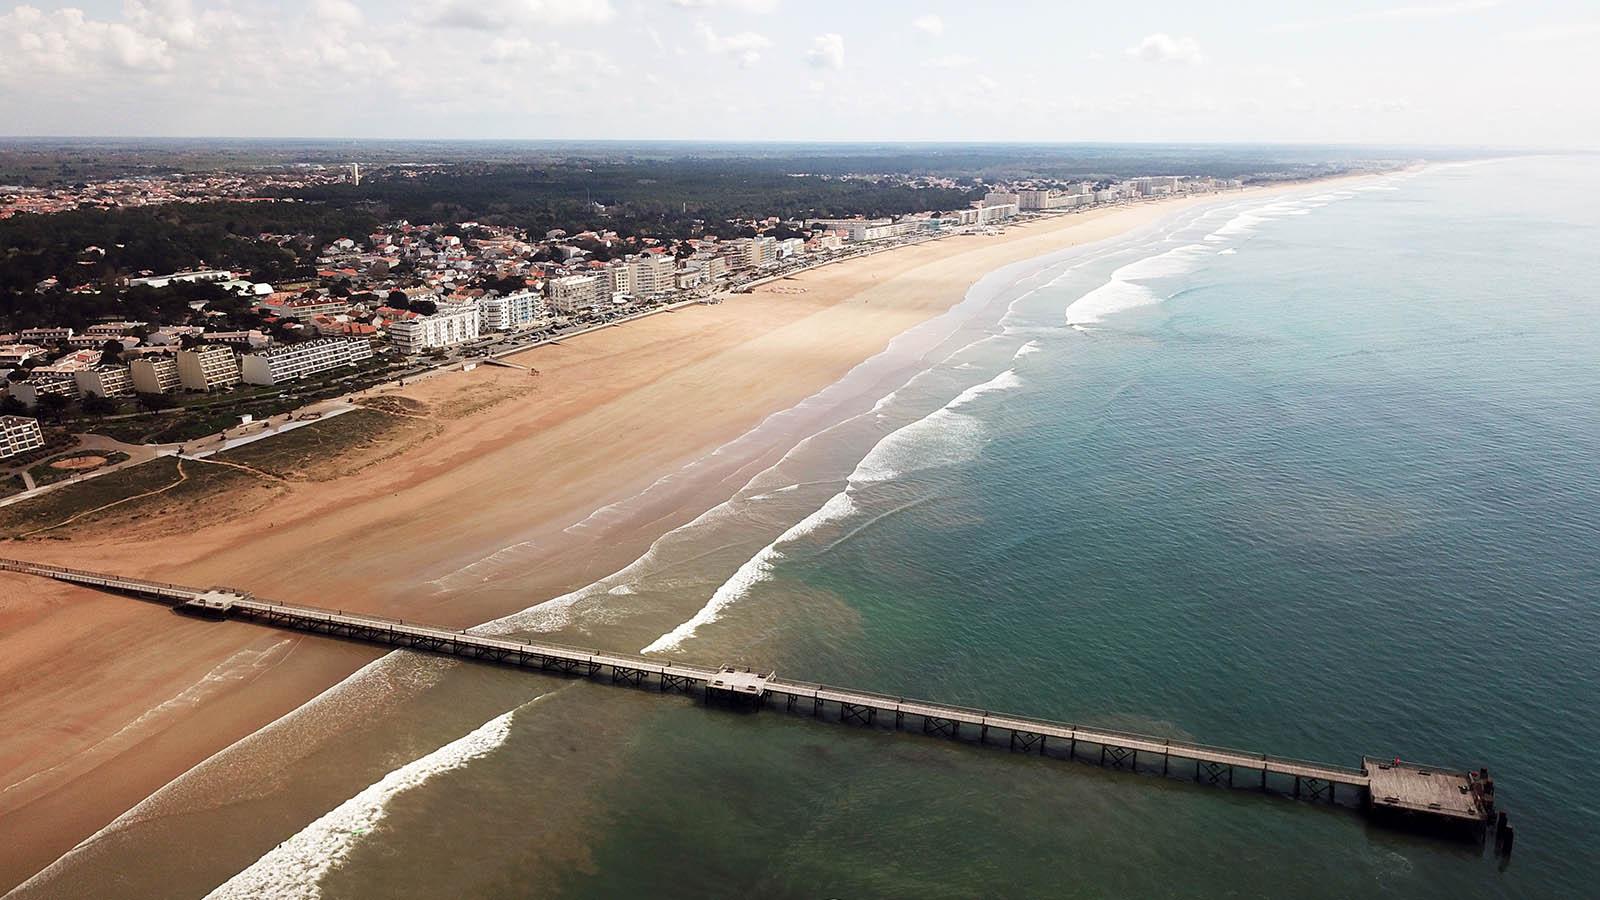 plages-estacade-vendee-florian_peroud